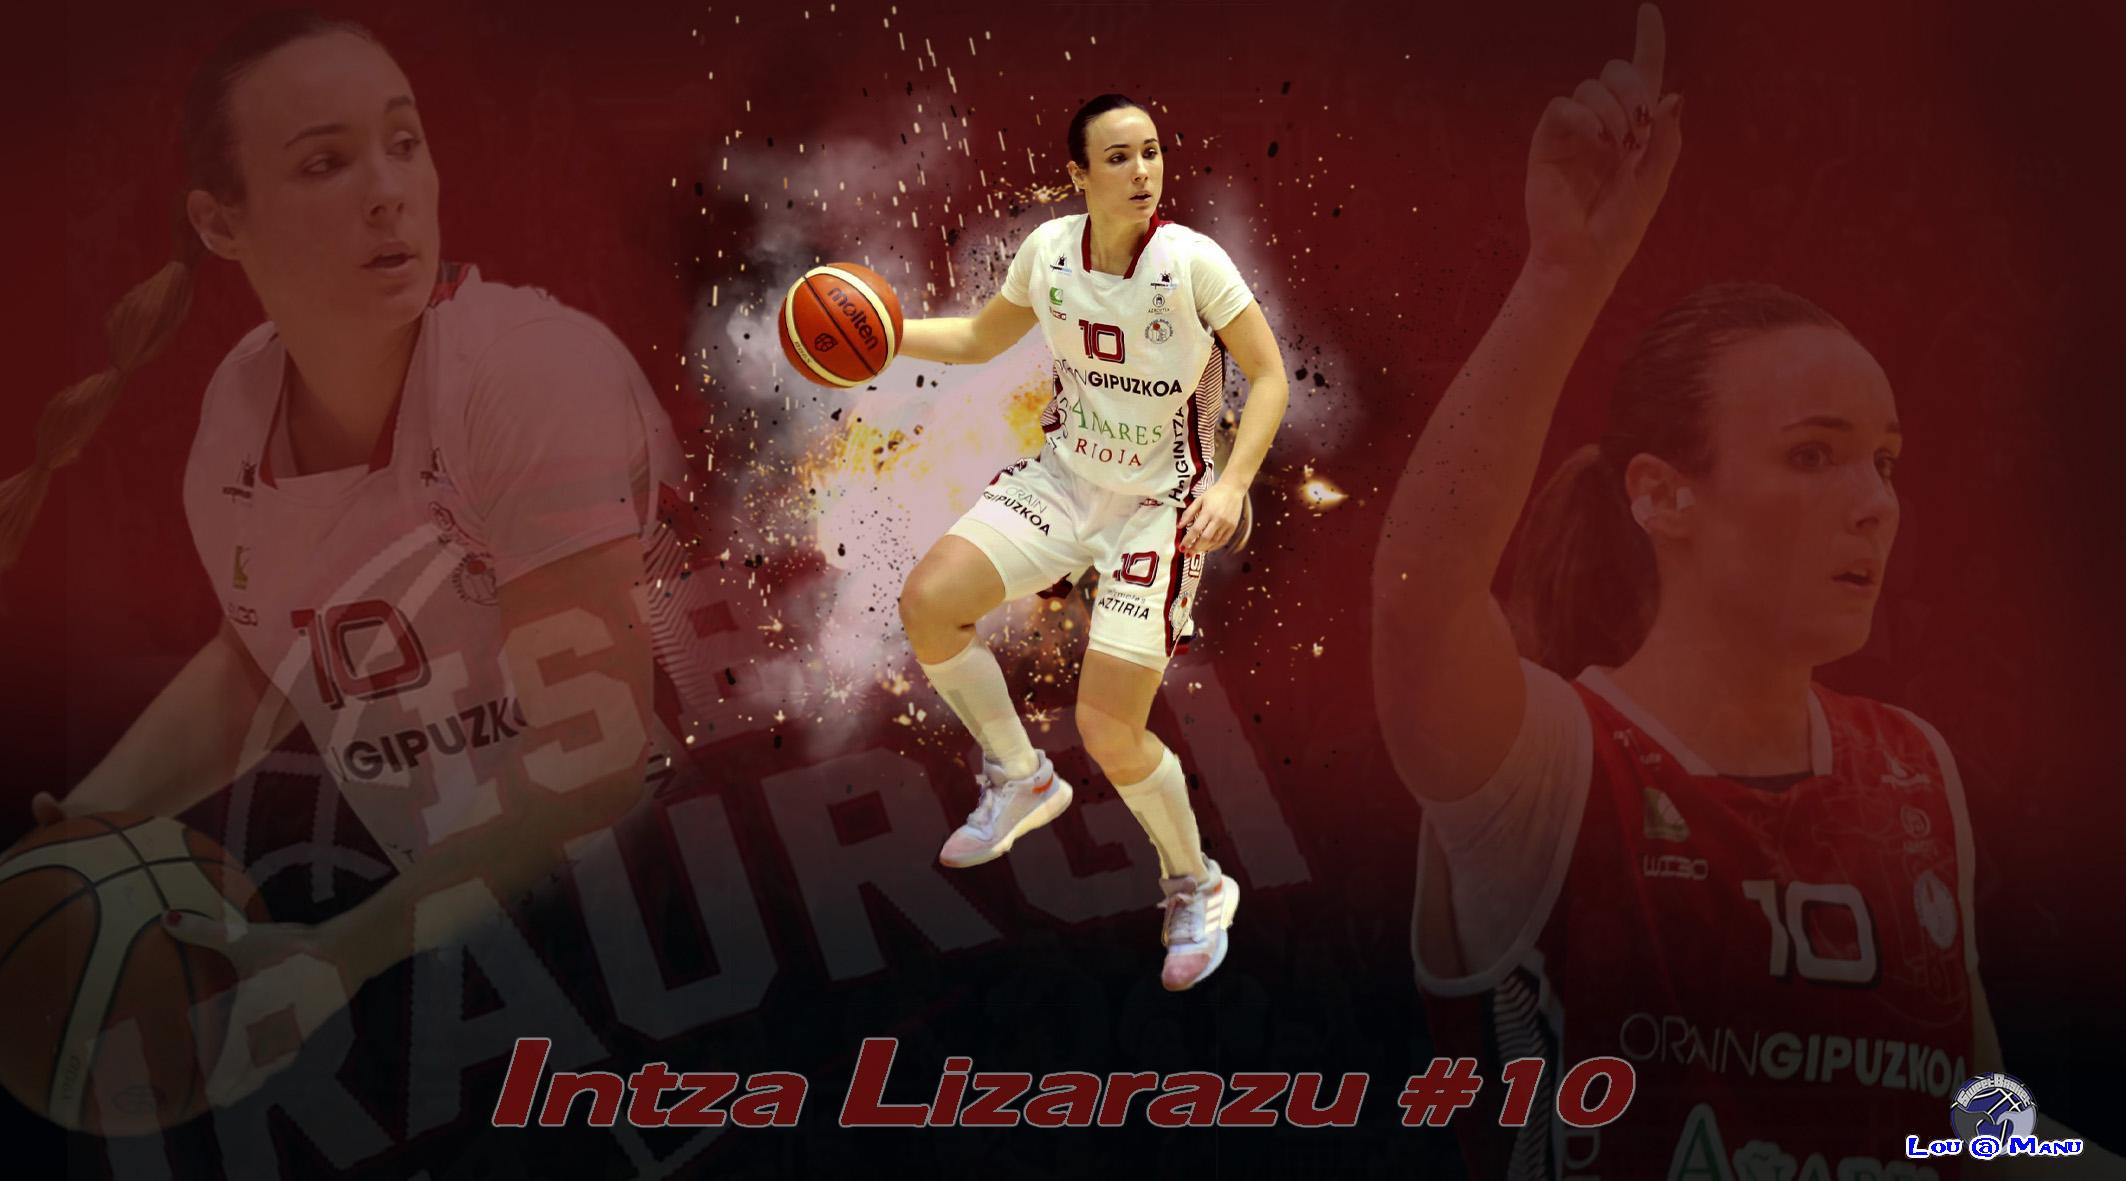 Wallpaper-IntzaLizarazuCollage-1